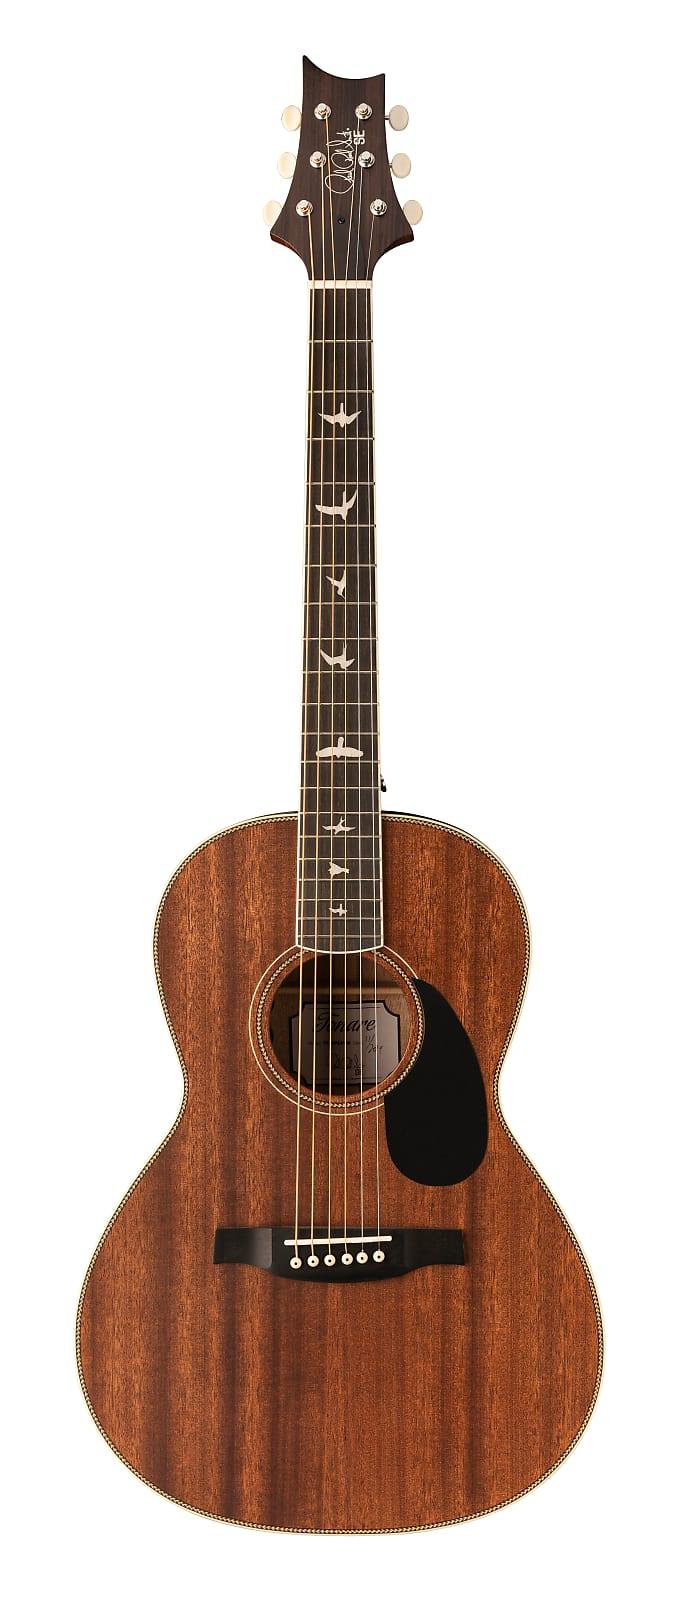 Paul Reed Smith PRS SE P20E Tonare Parlor Acoustic Electric Guitar Vintage Maho